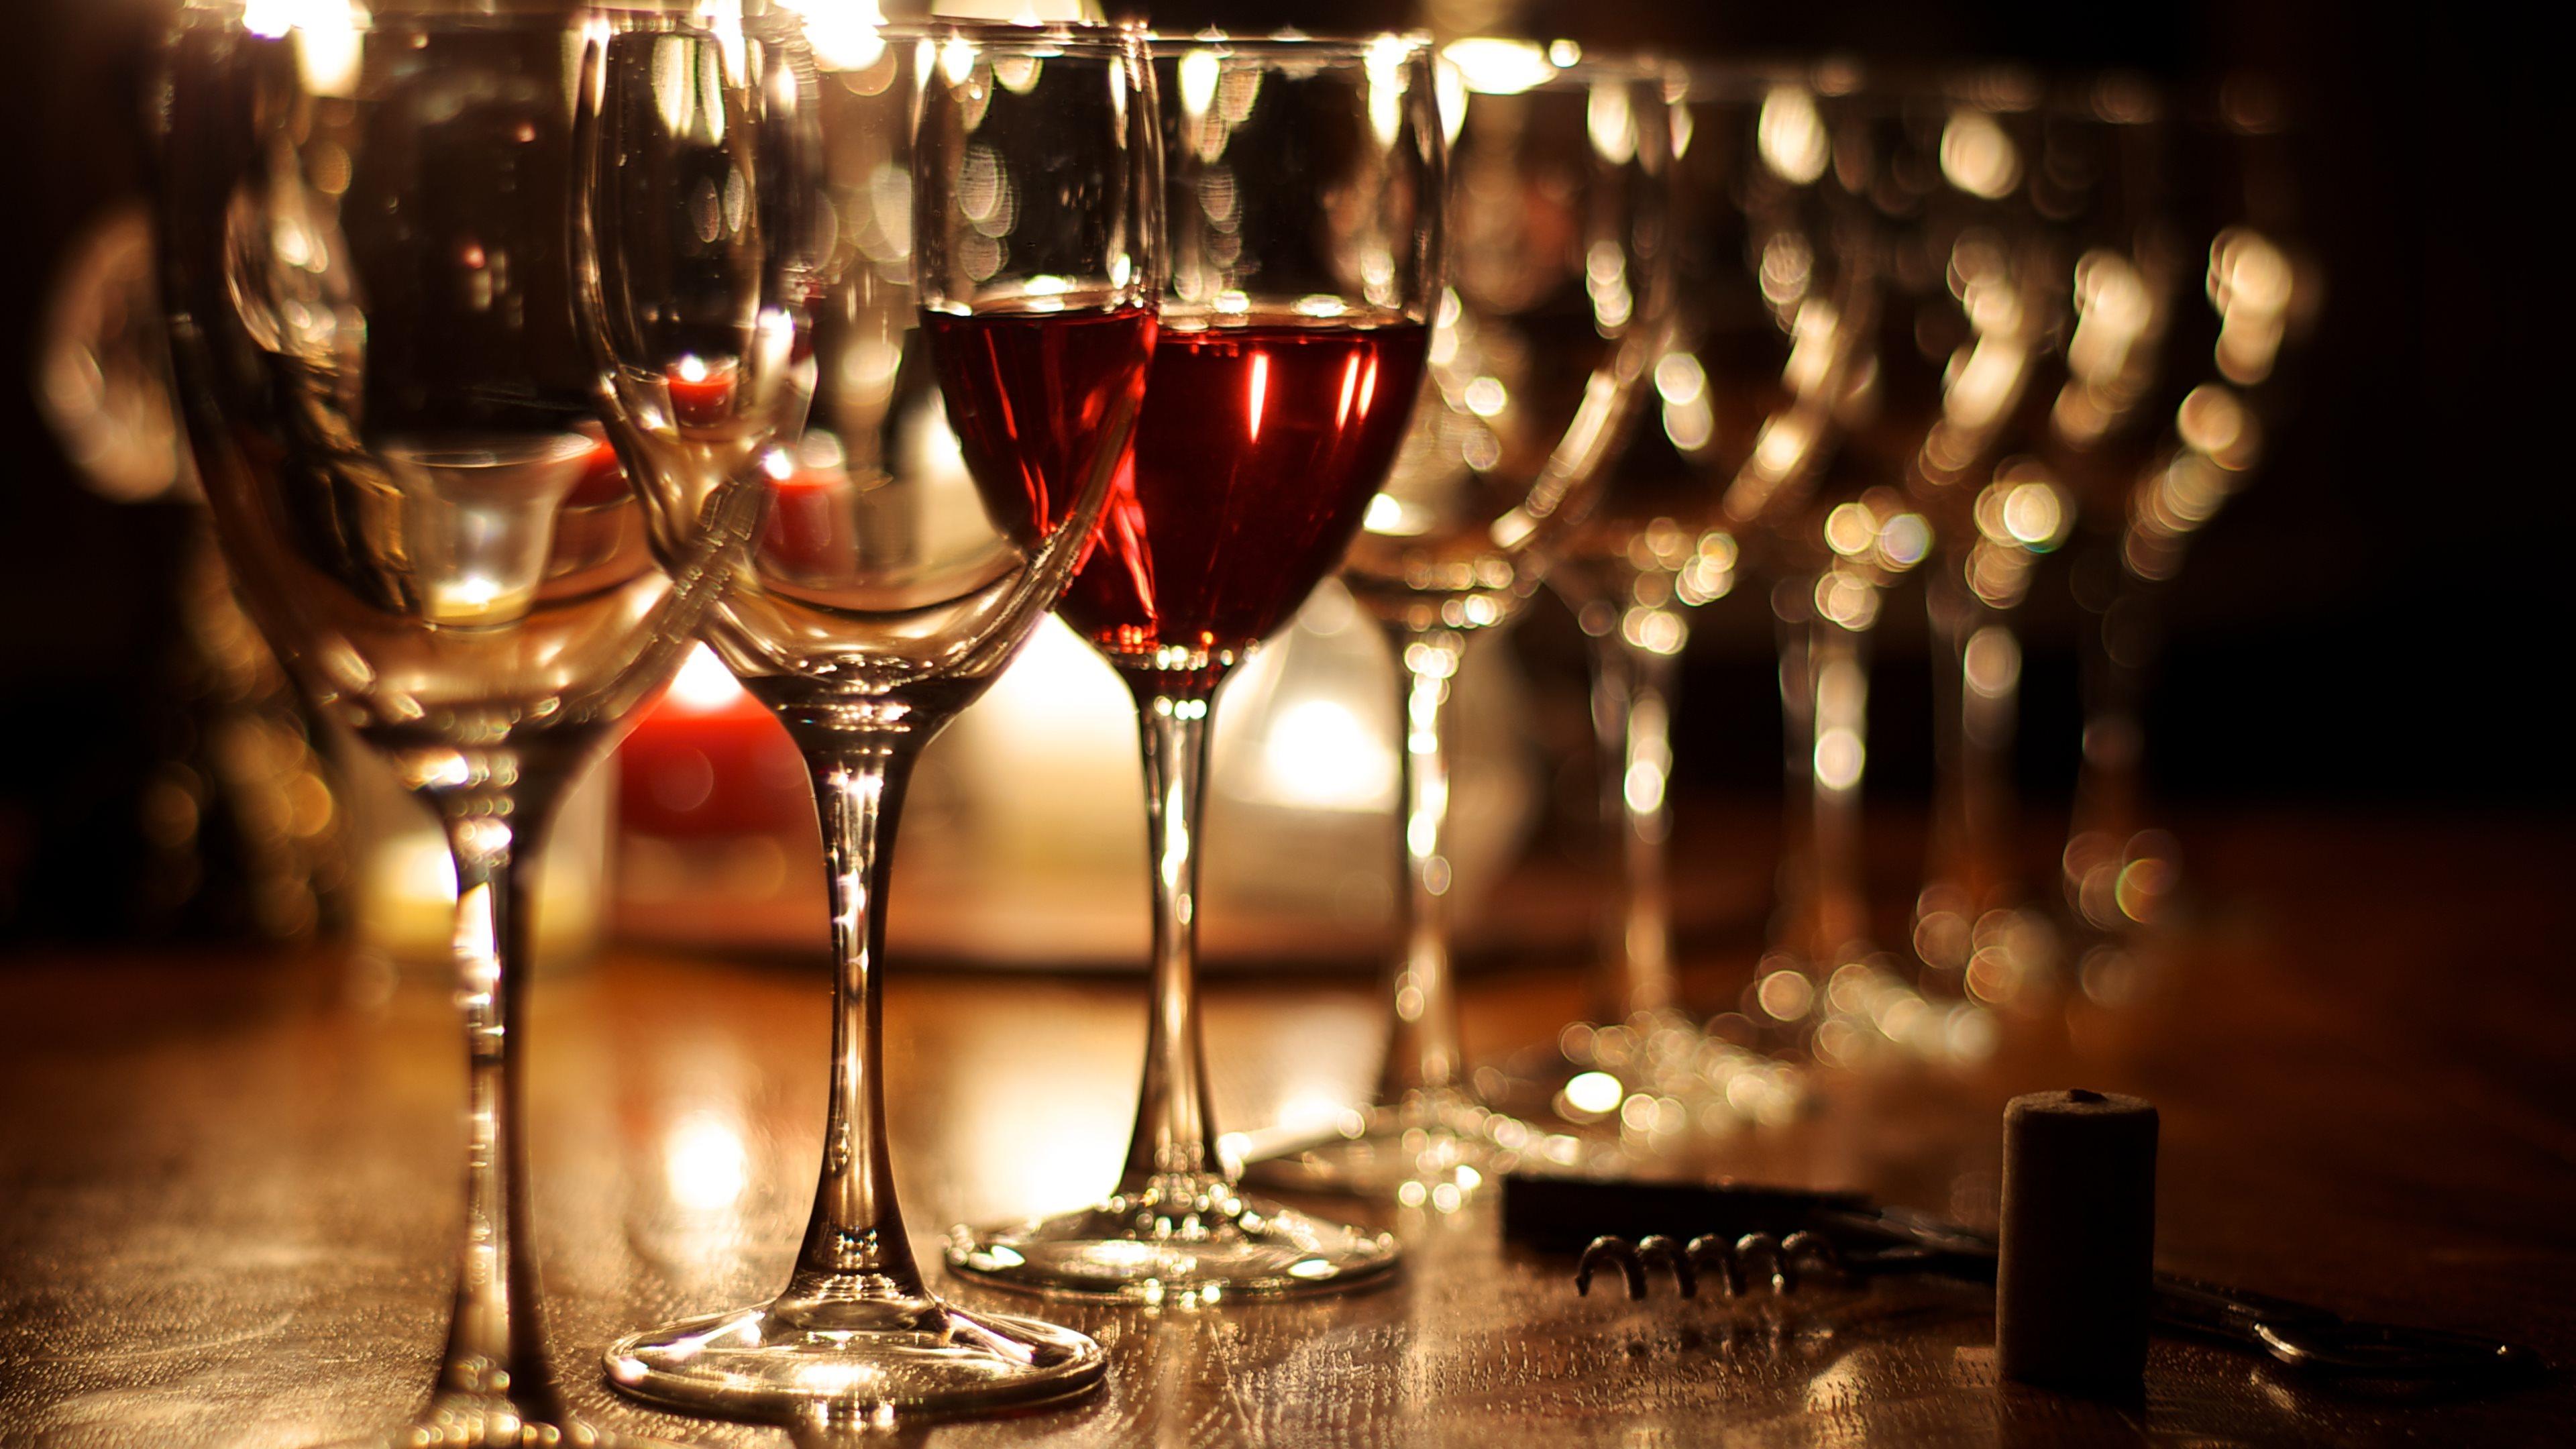 wine glasses widescreen wallpaper 62575